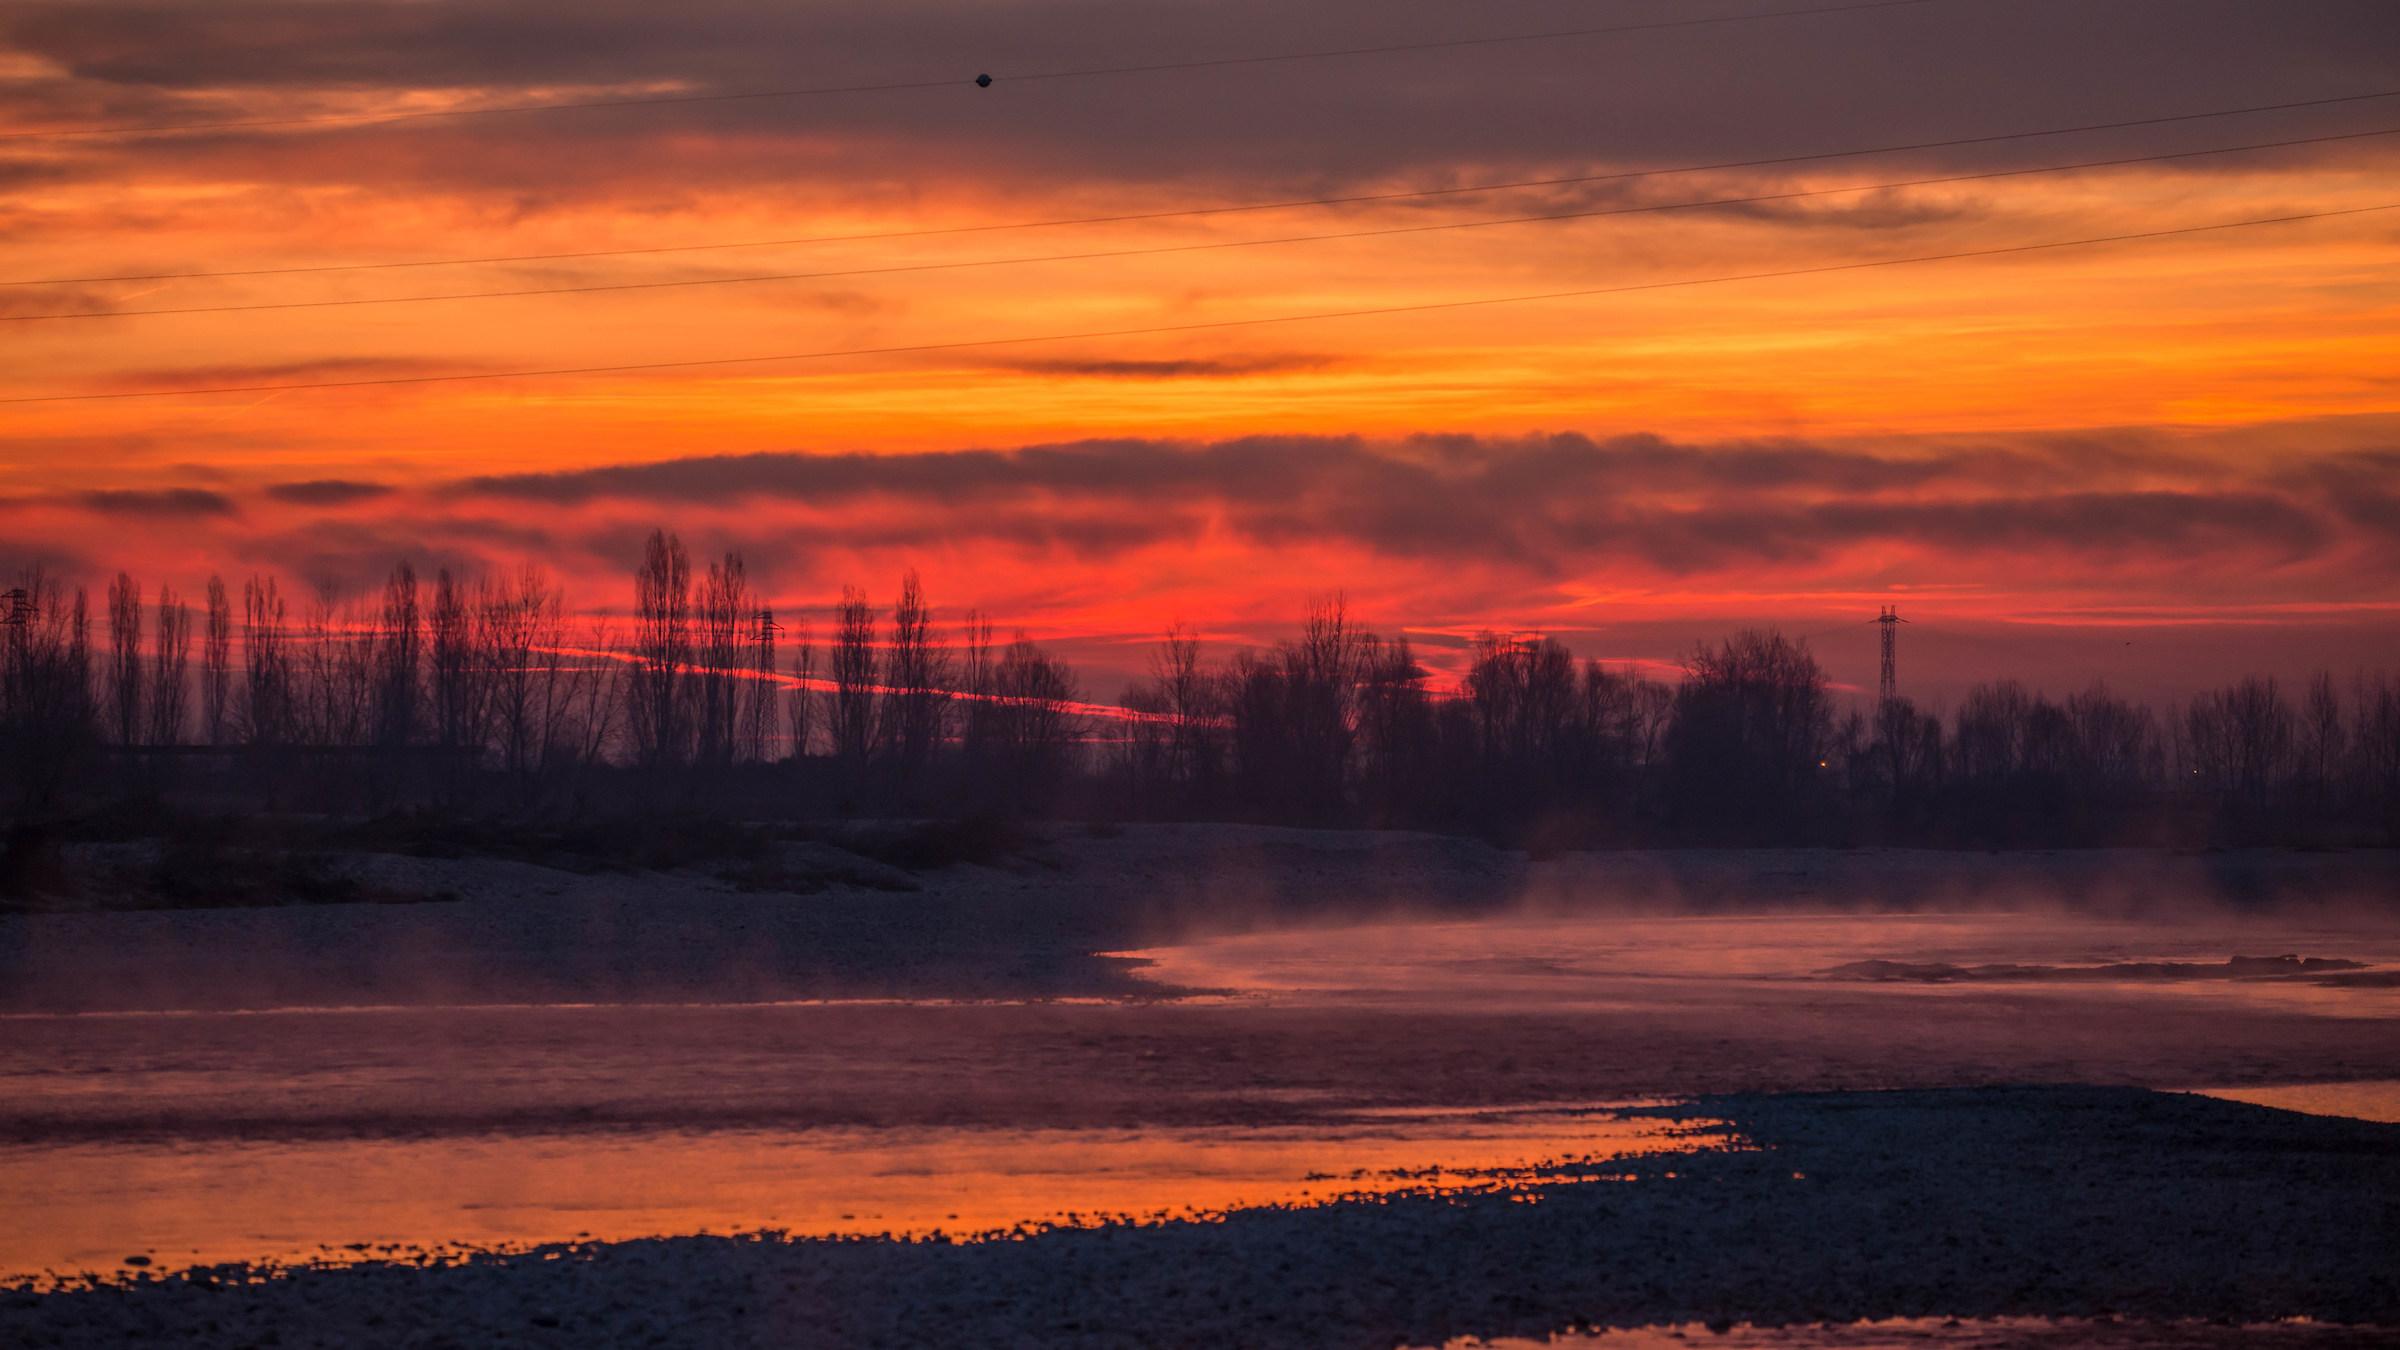 Sunrise or sunset?...